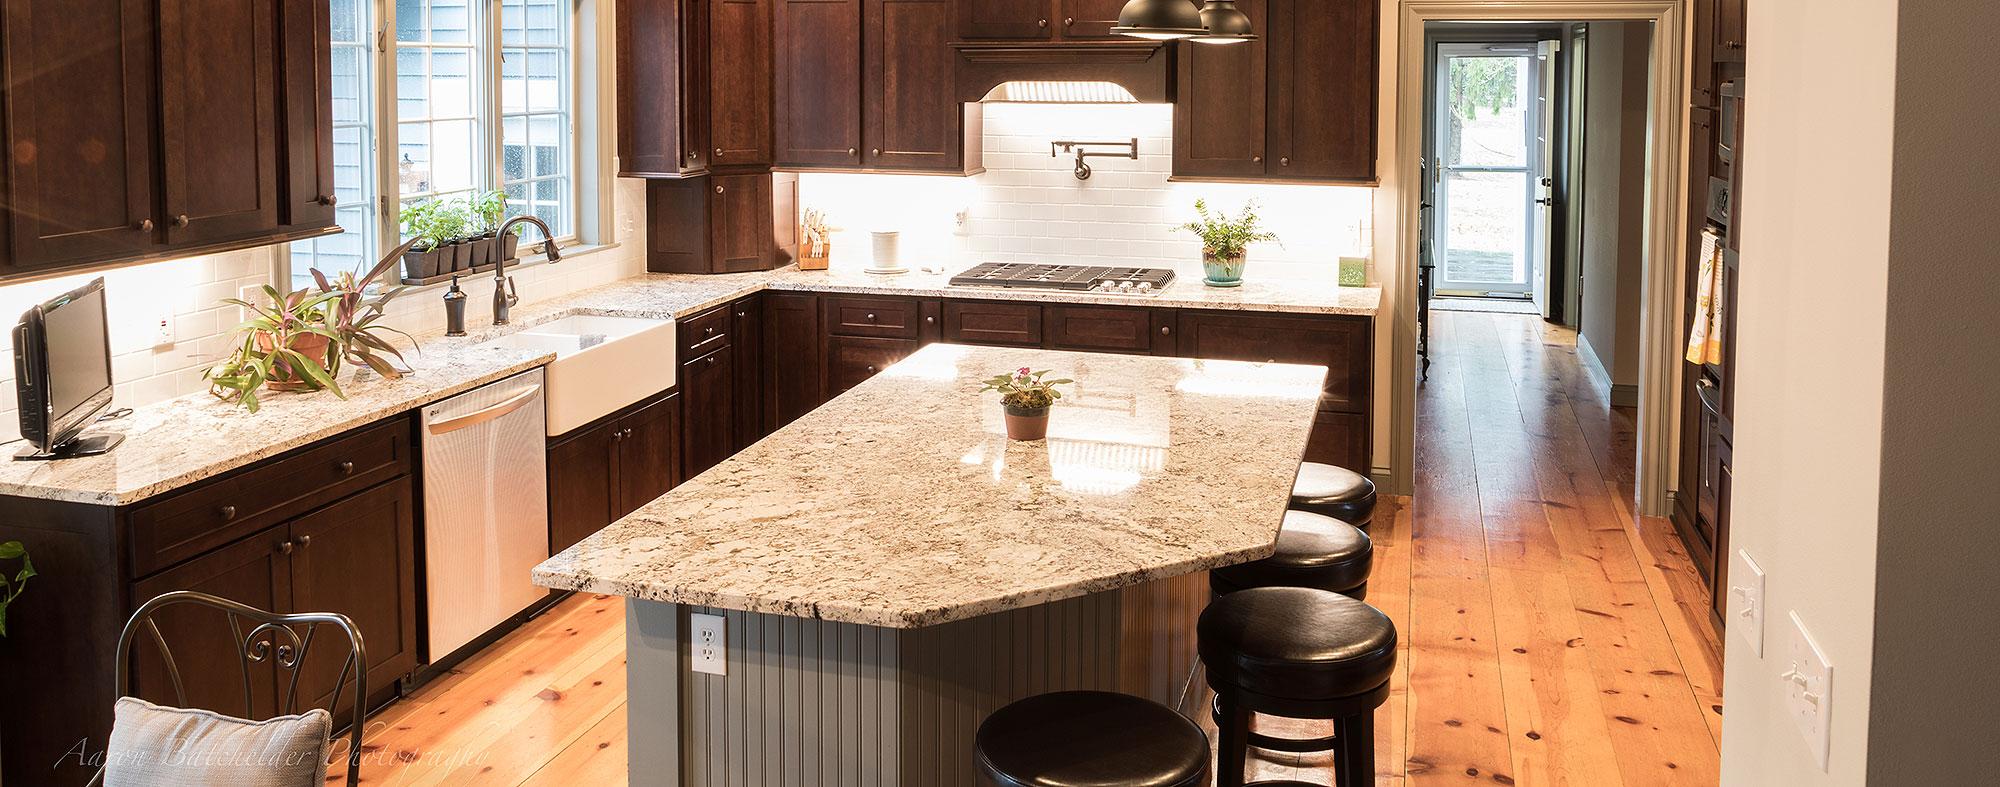 Cabinets and Granite Countertop